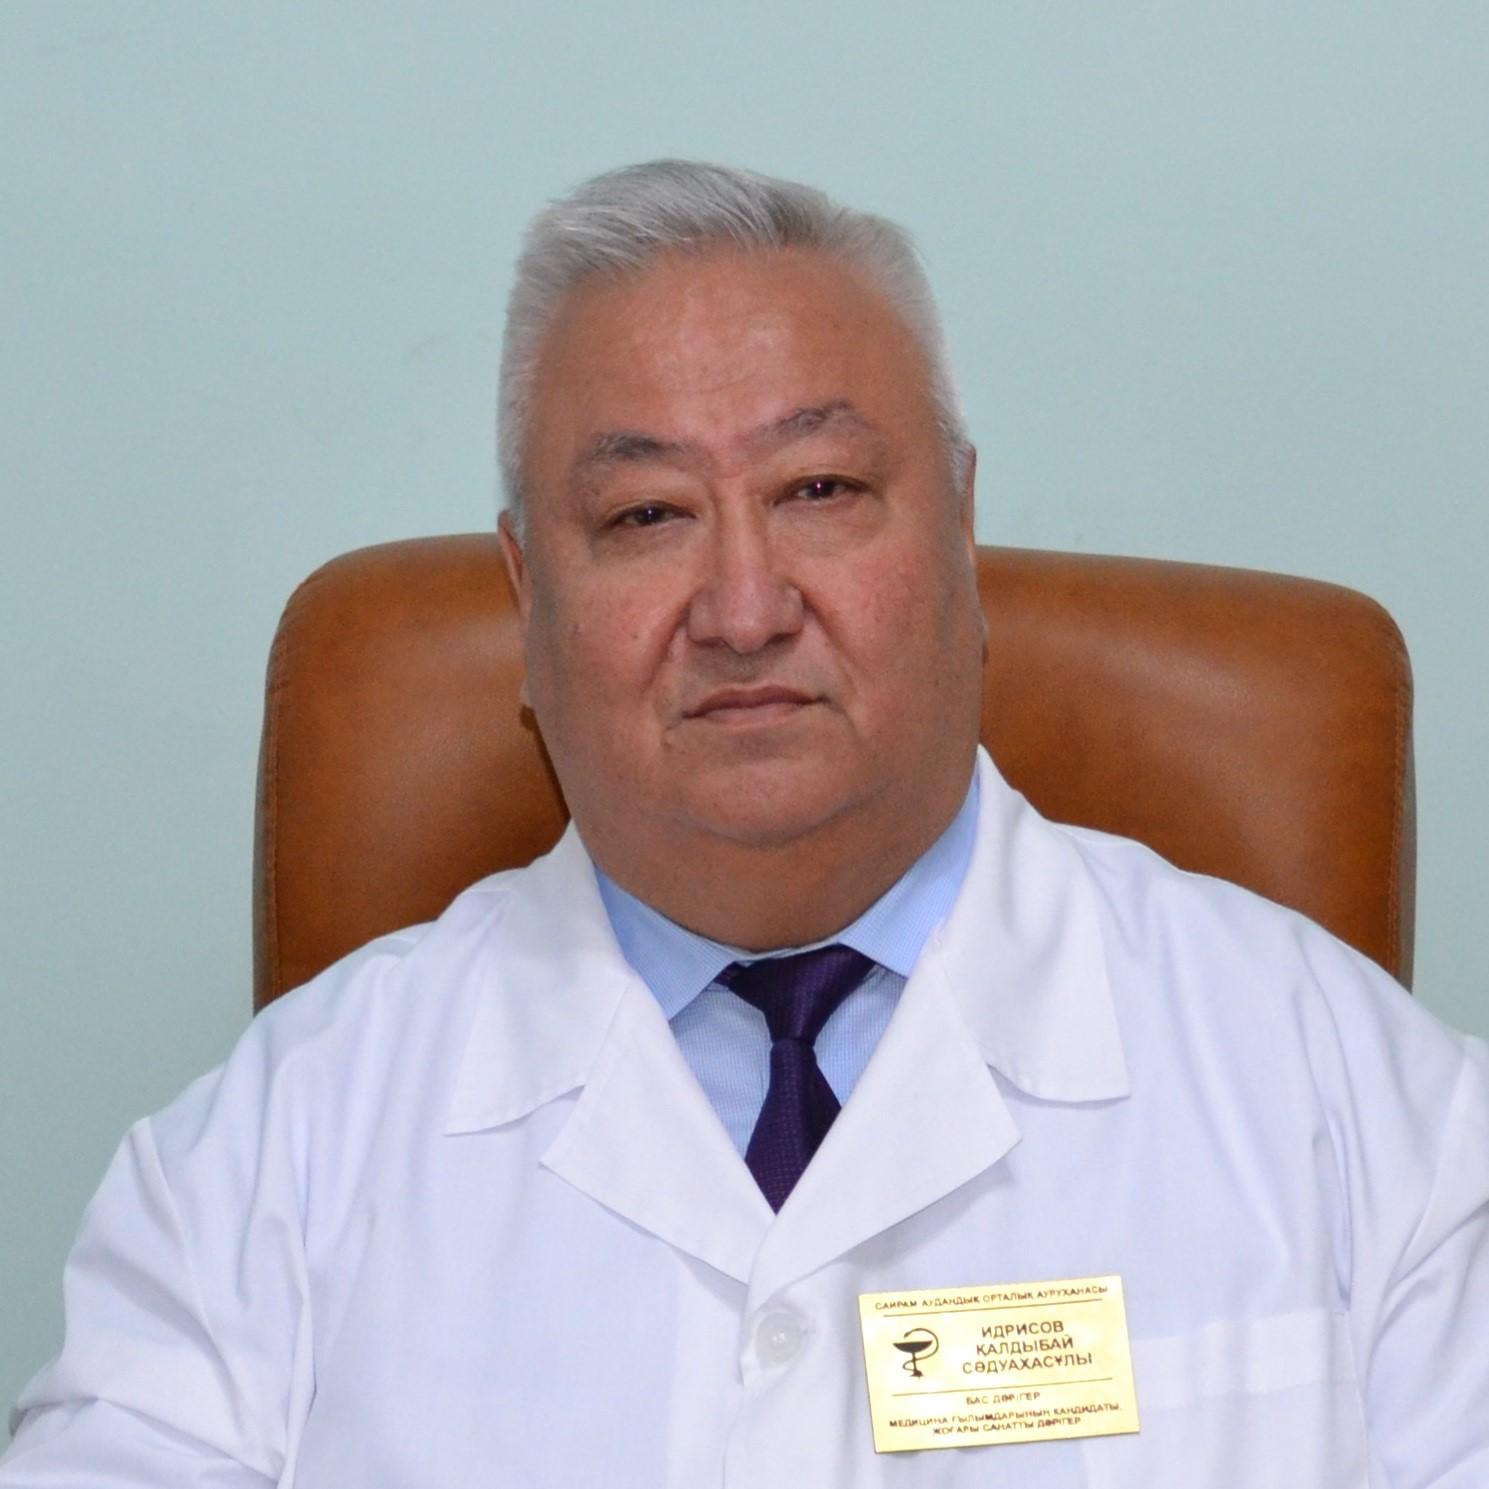 Идрисов Калдыбай Садуахасович